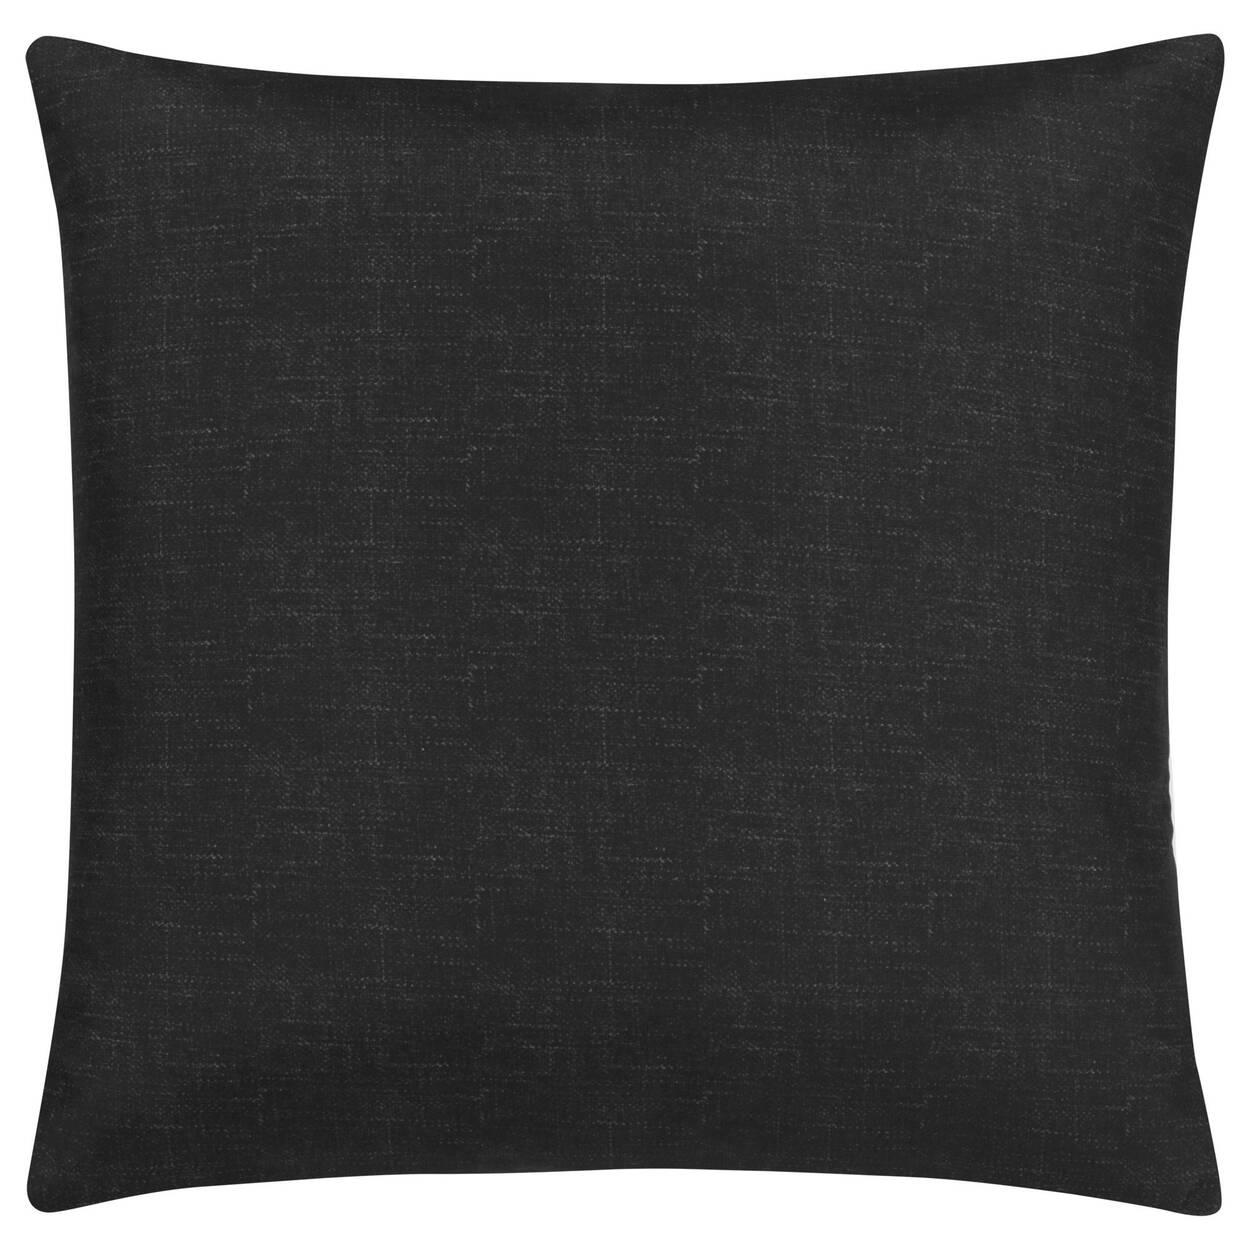 "Tiguidou Decorative Pillow Cover 18"" X 18"""